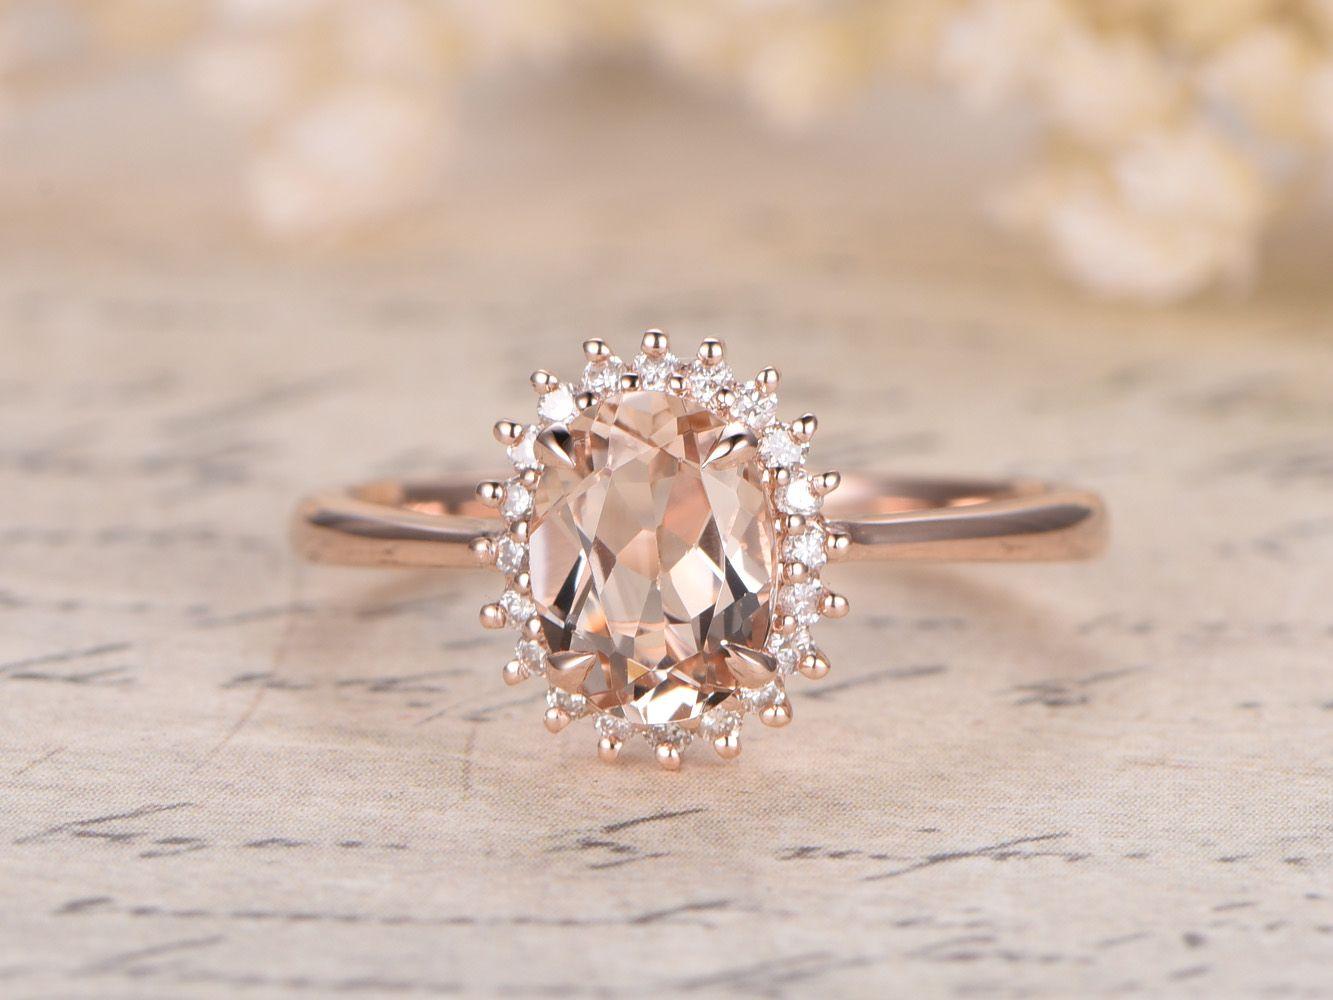 morganite engagement rings morganite wedding ring set Princess Diana Ring mm Oval VS Pink Morganite Ring 14K Rose Gold Morganite Engagement